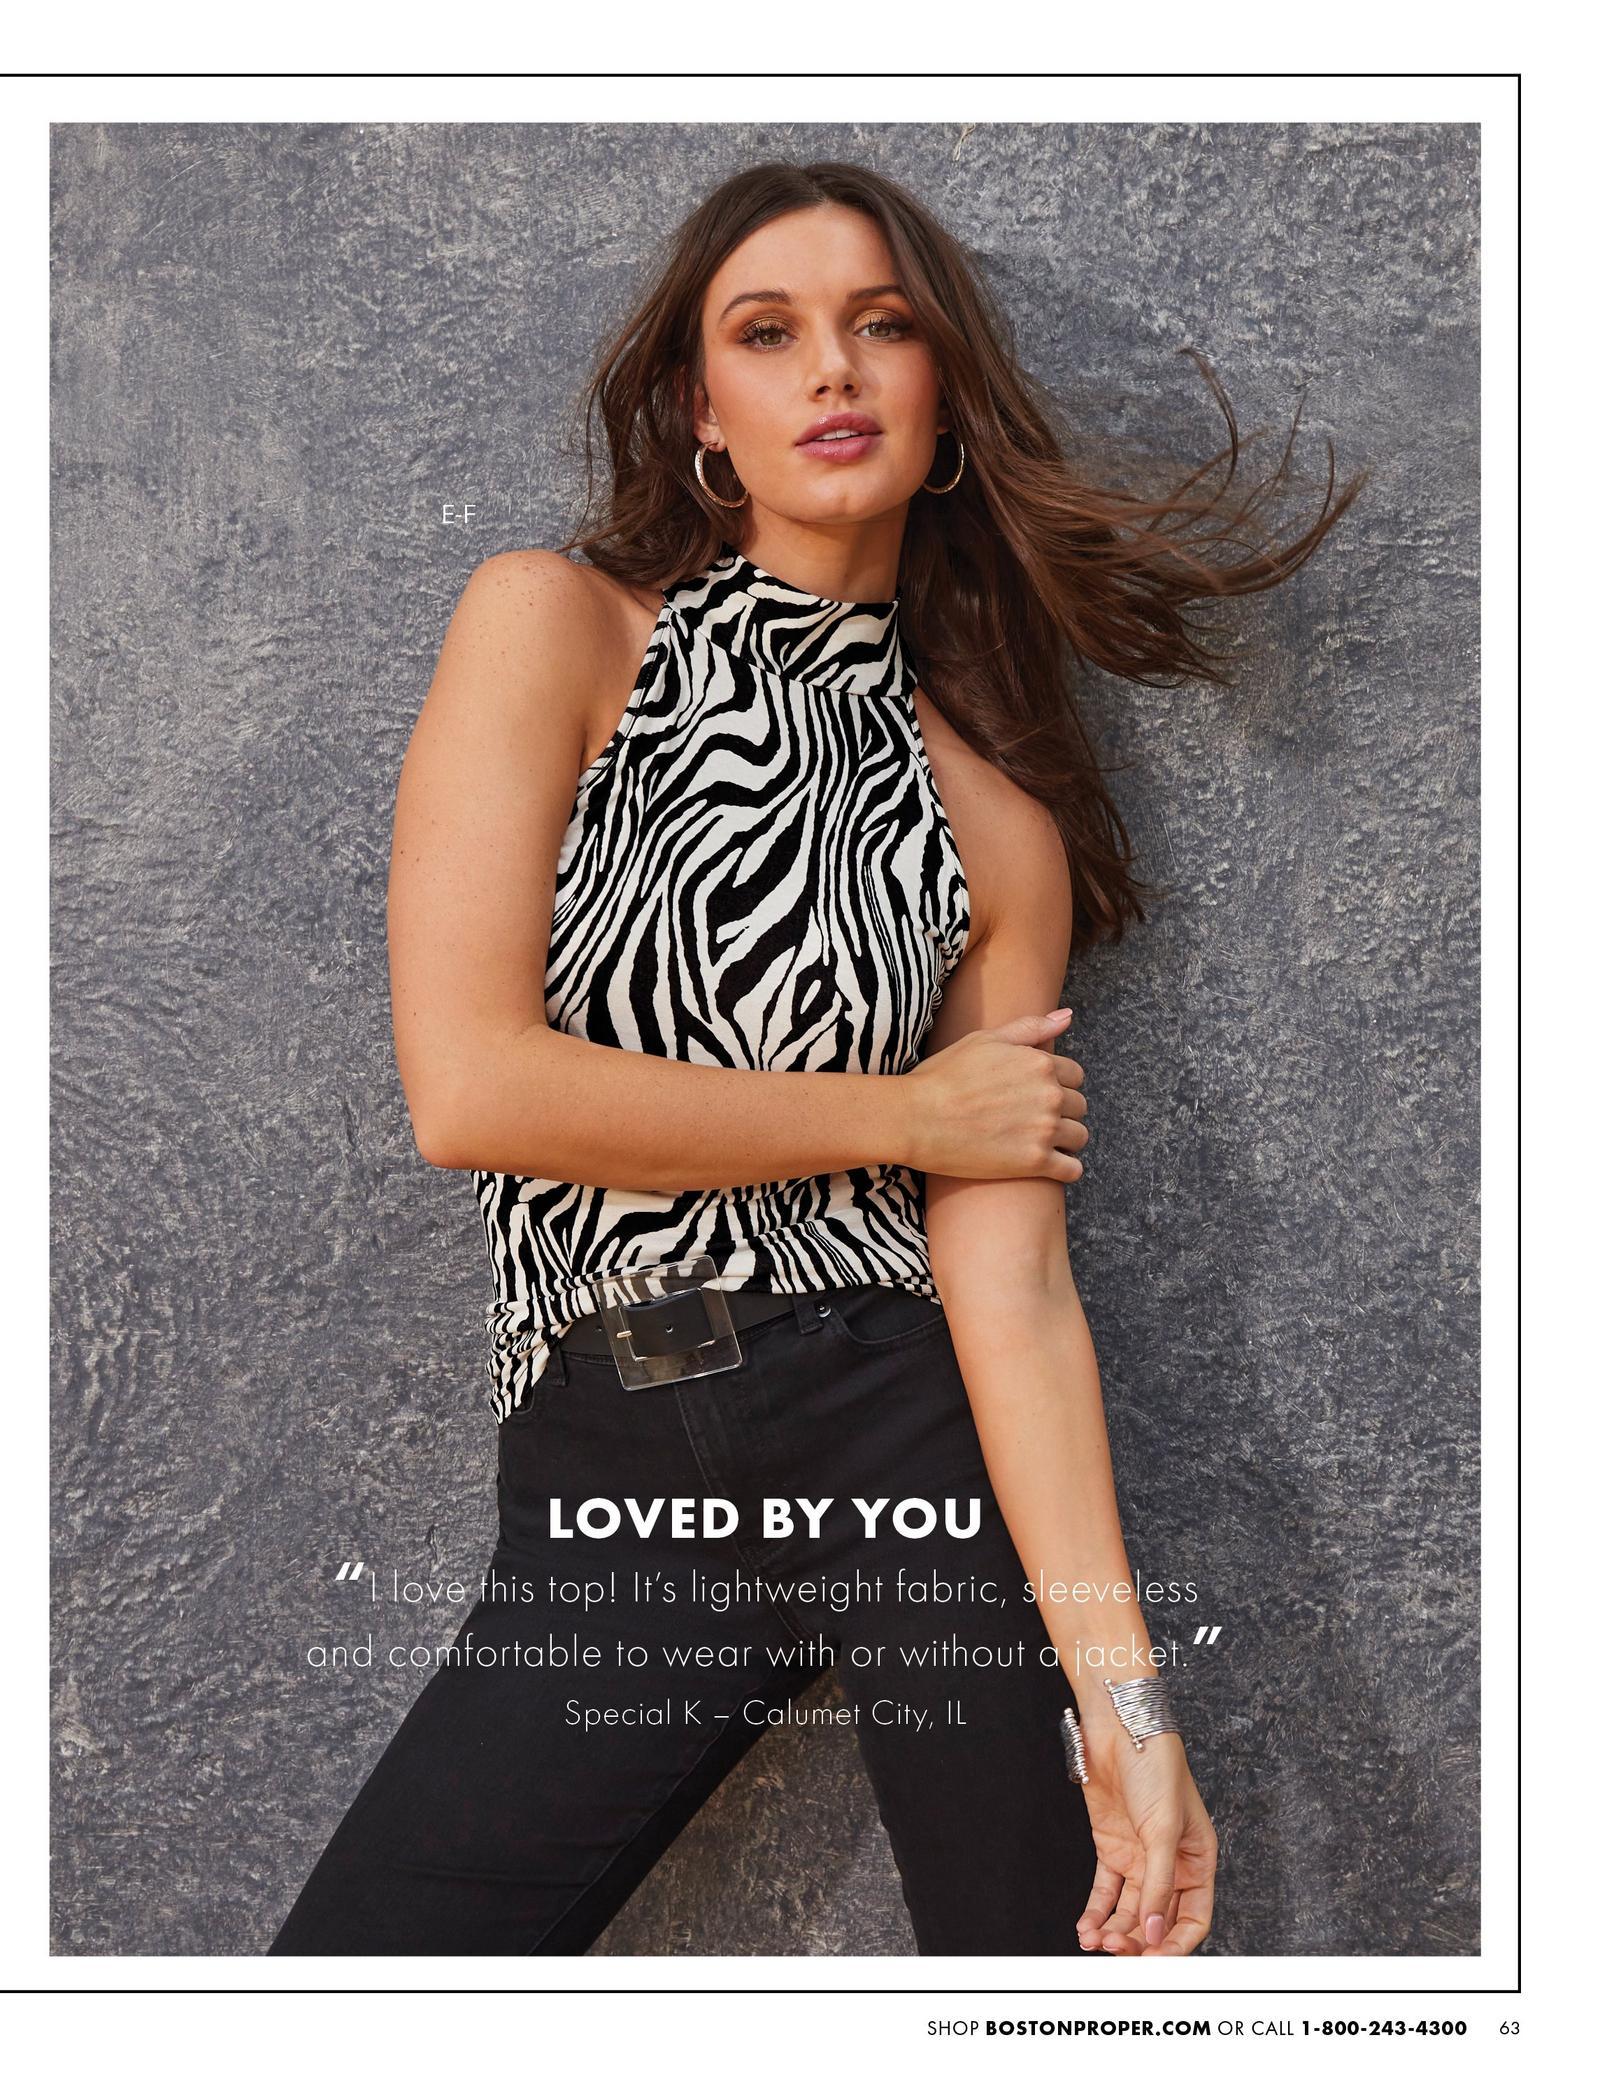 model wearing a black and white zebra print high-neck sleeveless top, black belt, and black jeans.